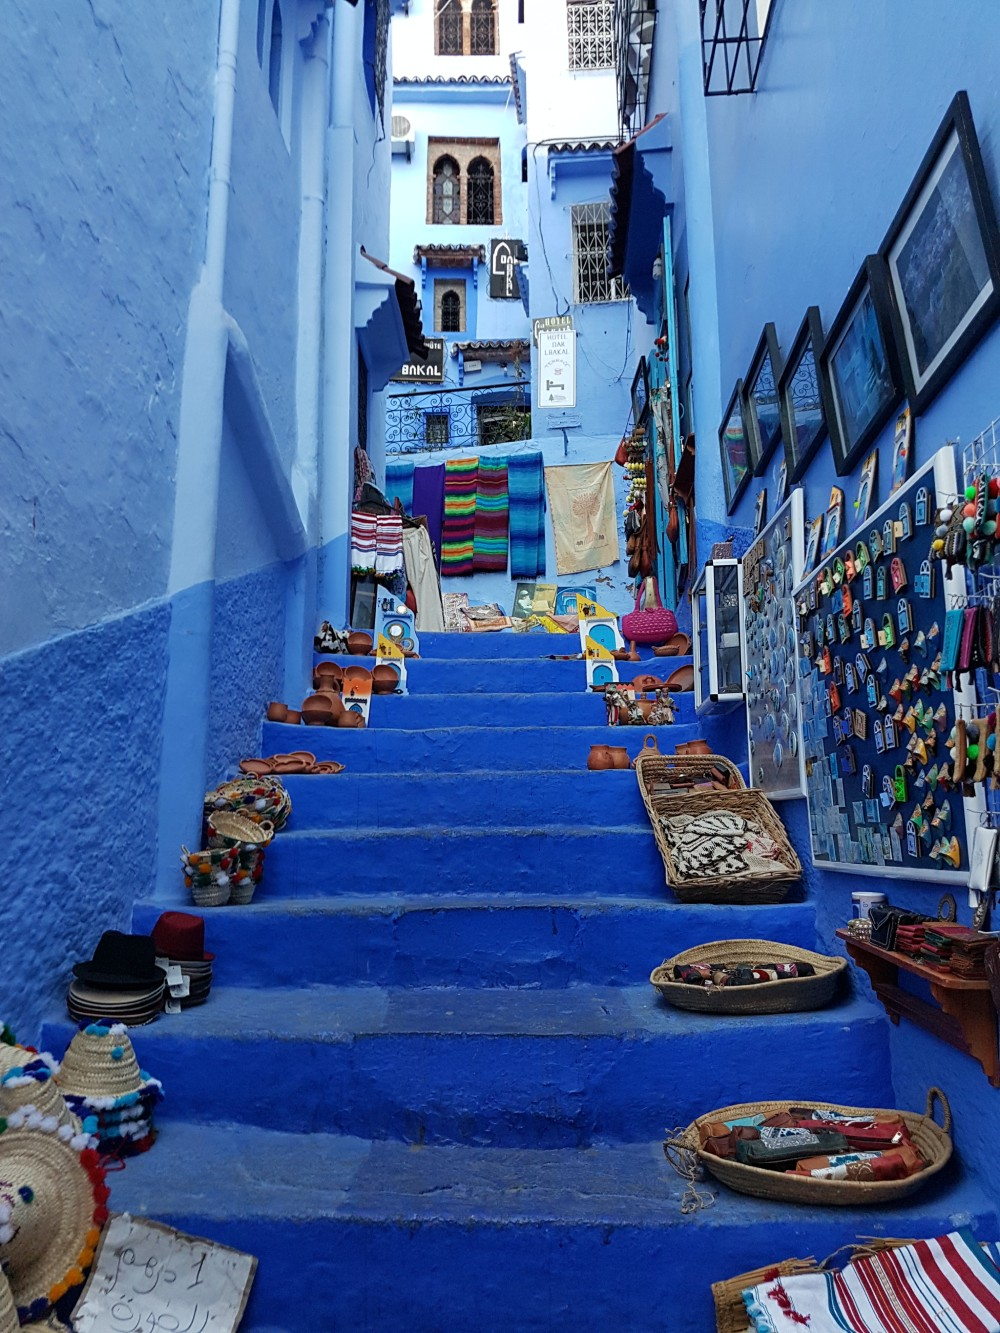 Tangier to Marrakech via desert Erg Chebbi 4 days